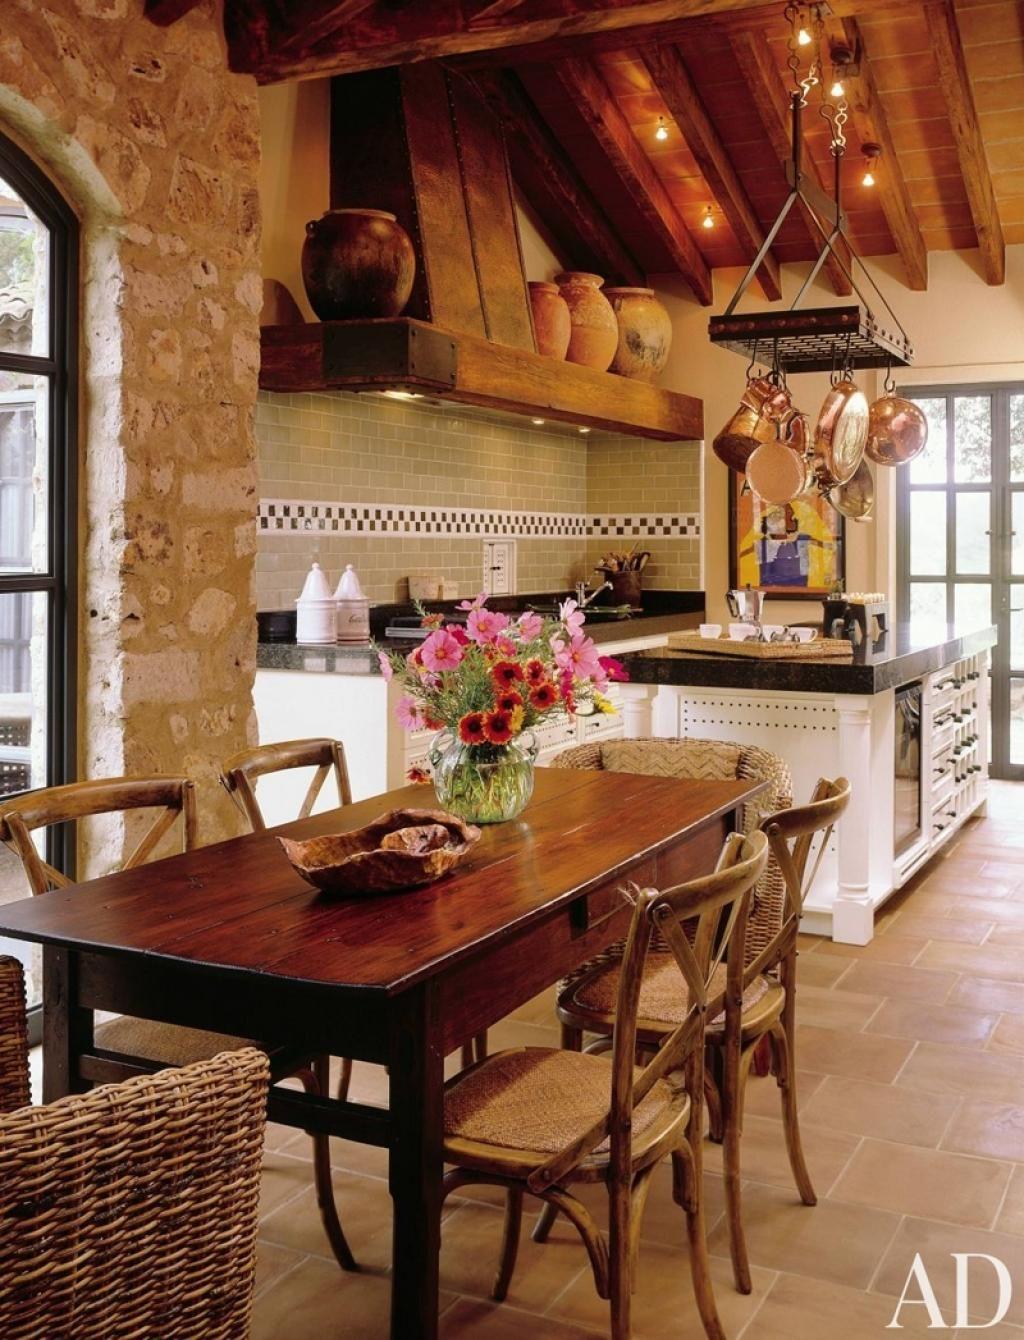 28 Alluring Contemporary Mexican Interior Design Ideas Interior